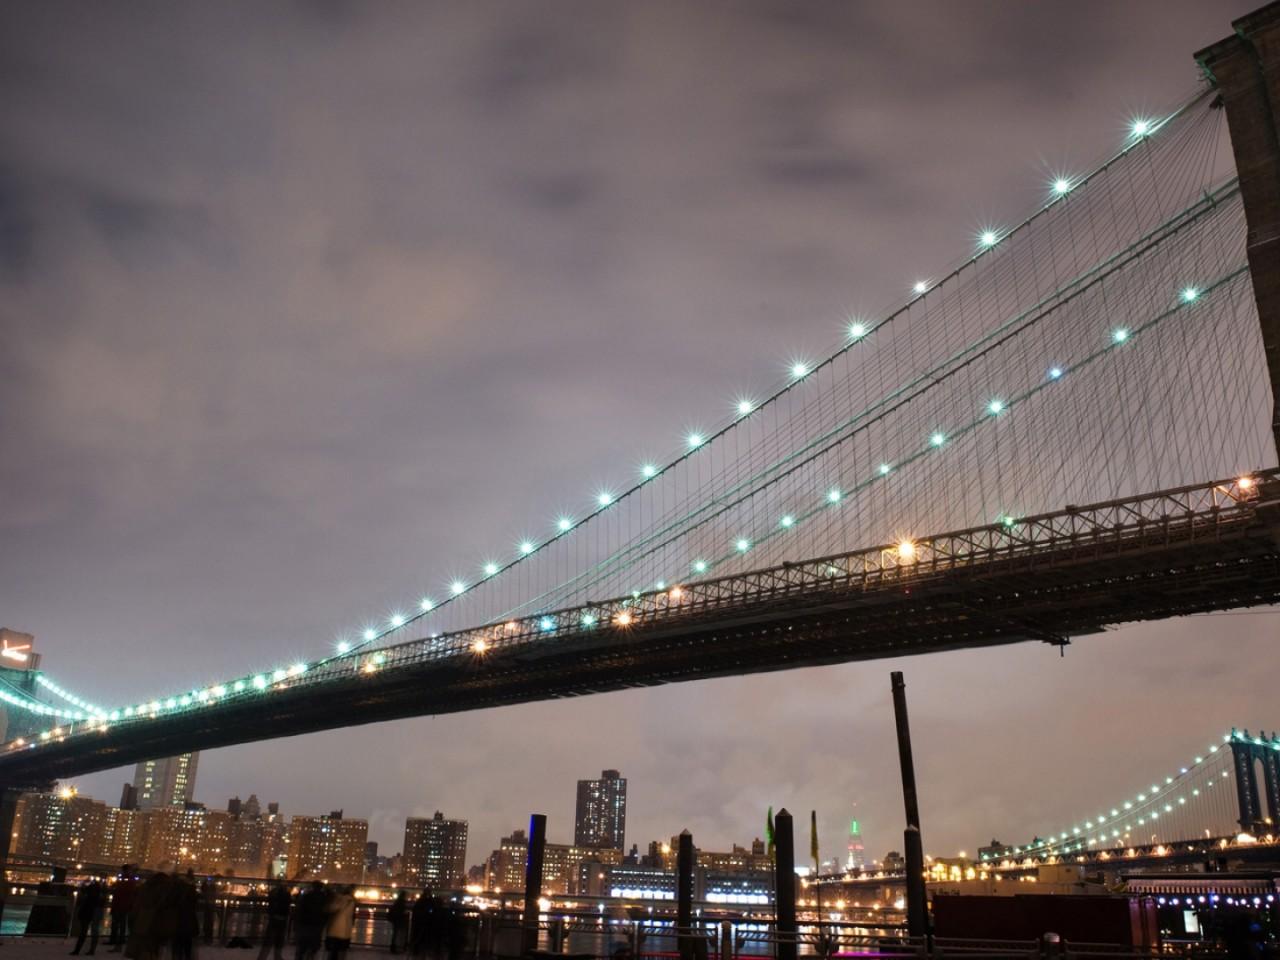 Download brooklyn bridge wallpaper HD wallpaper 1280x960